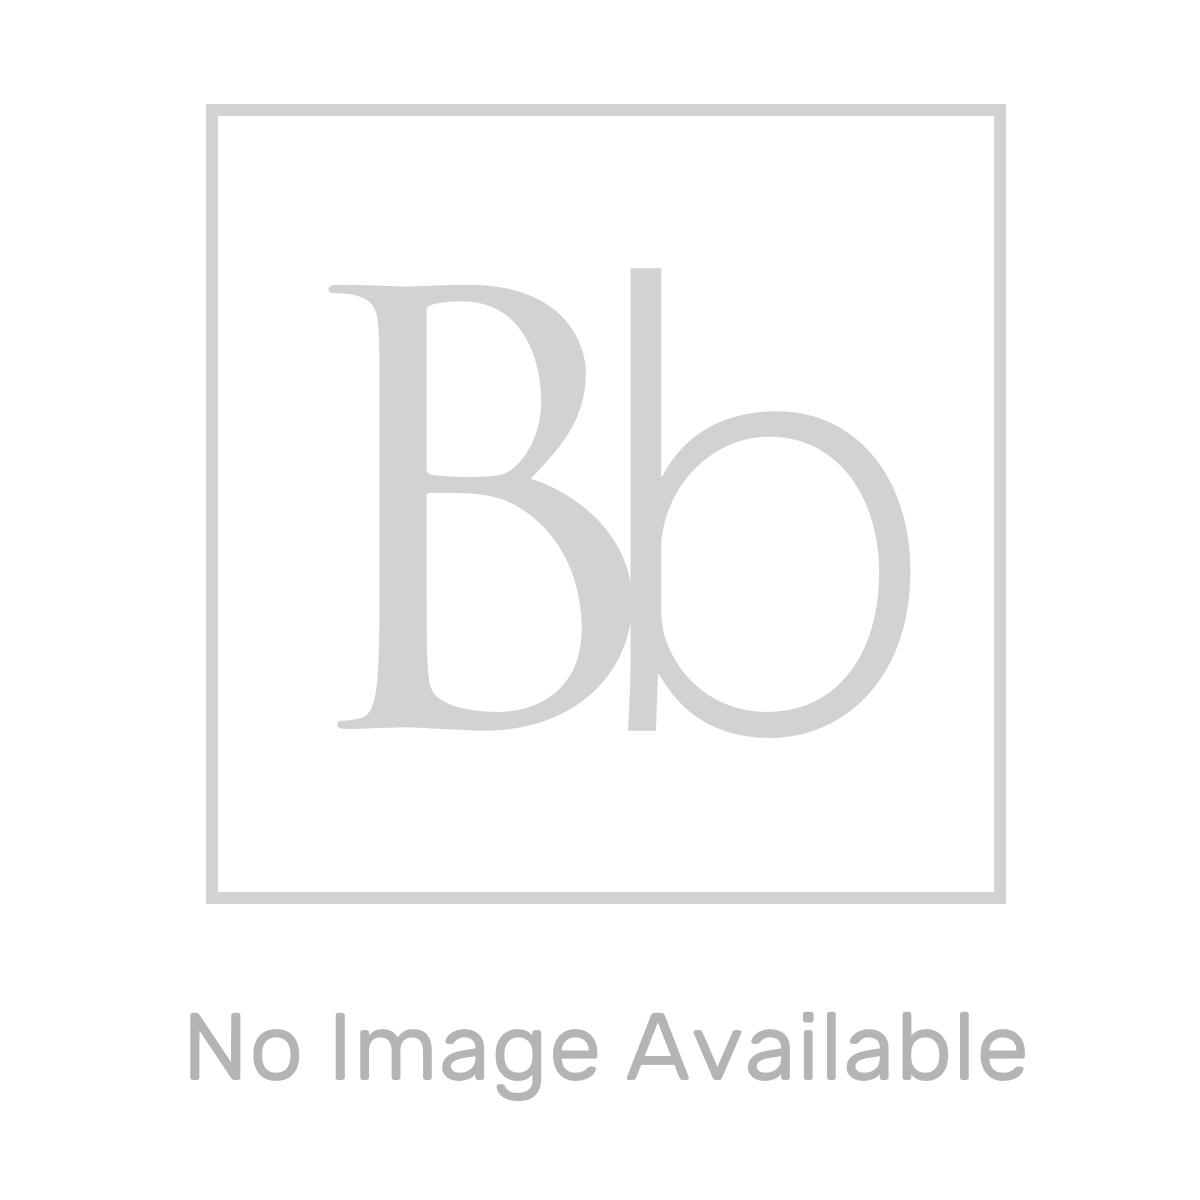 Aquadart White Slate Shower Tray 1600 x 760 Lifestyle